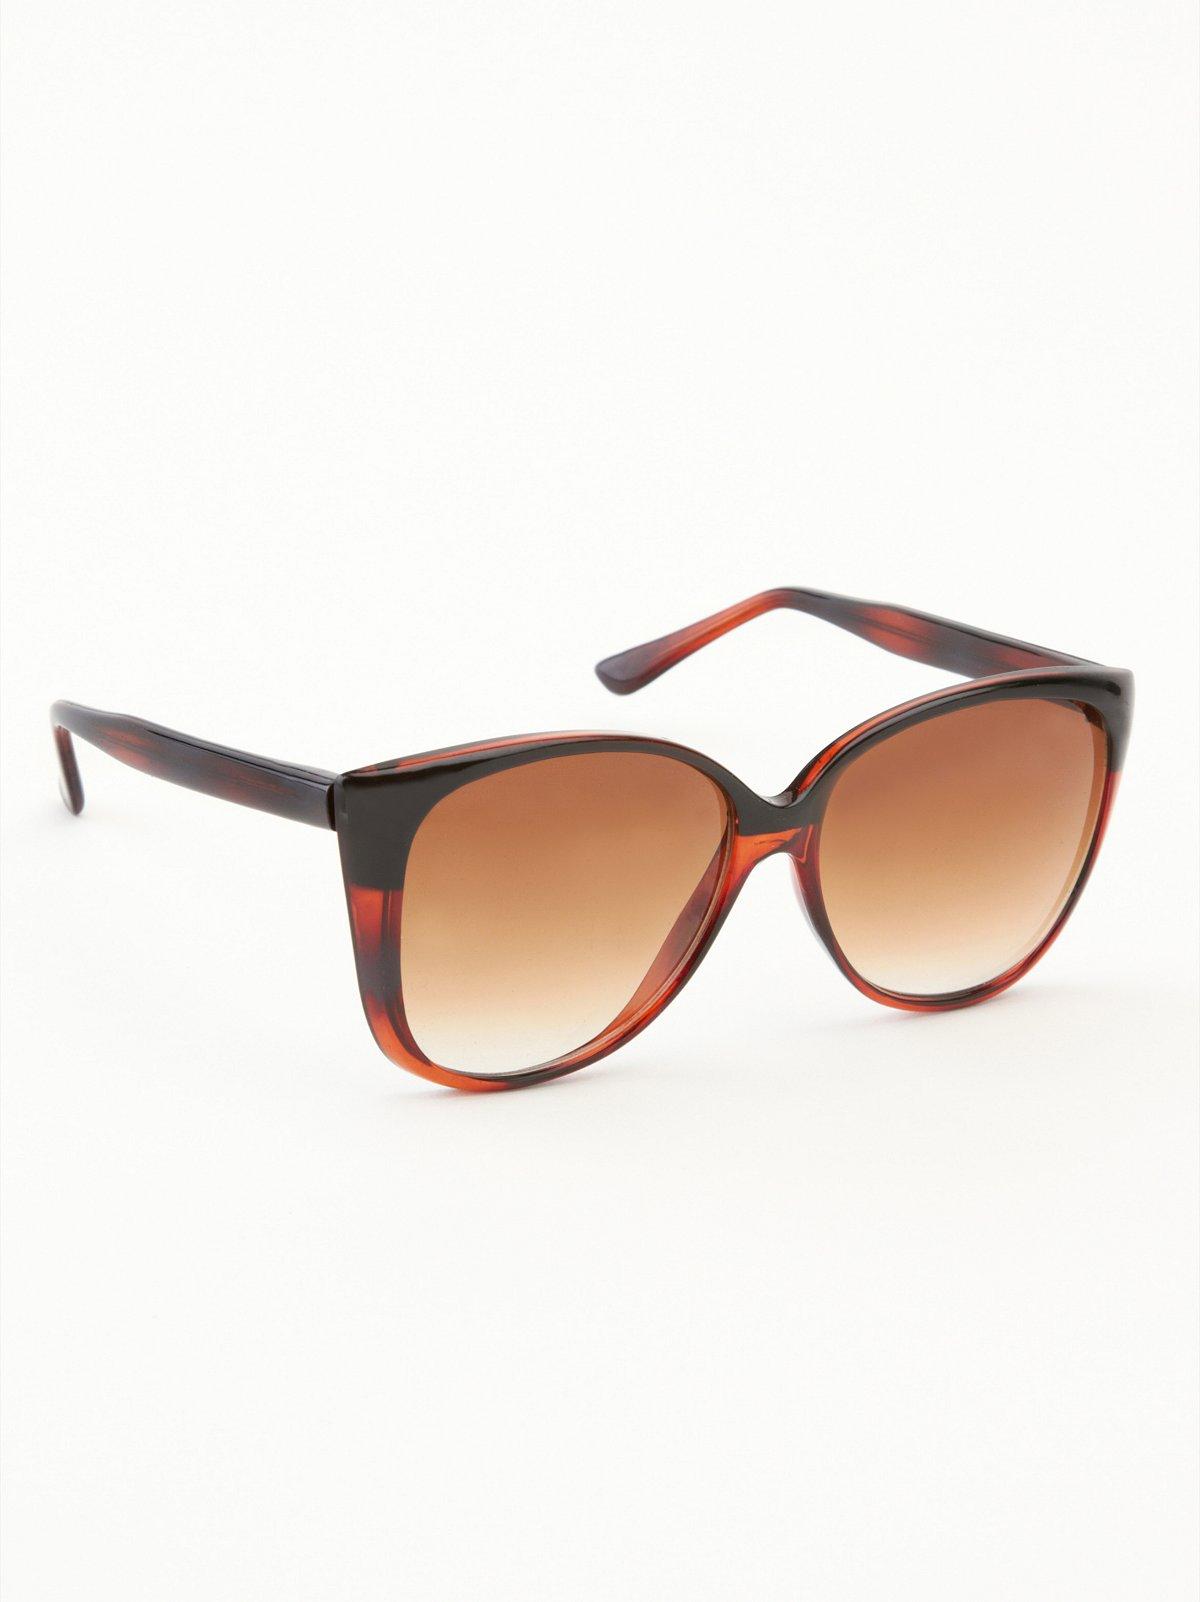 Disco Glam Sunglasses